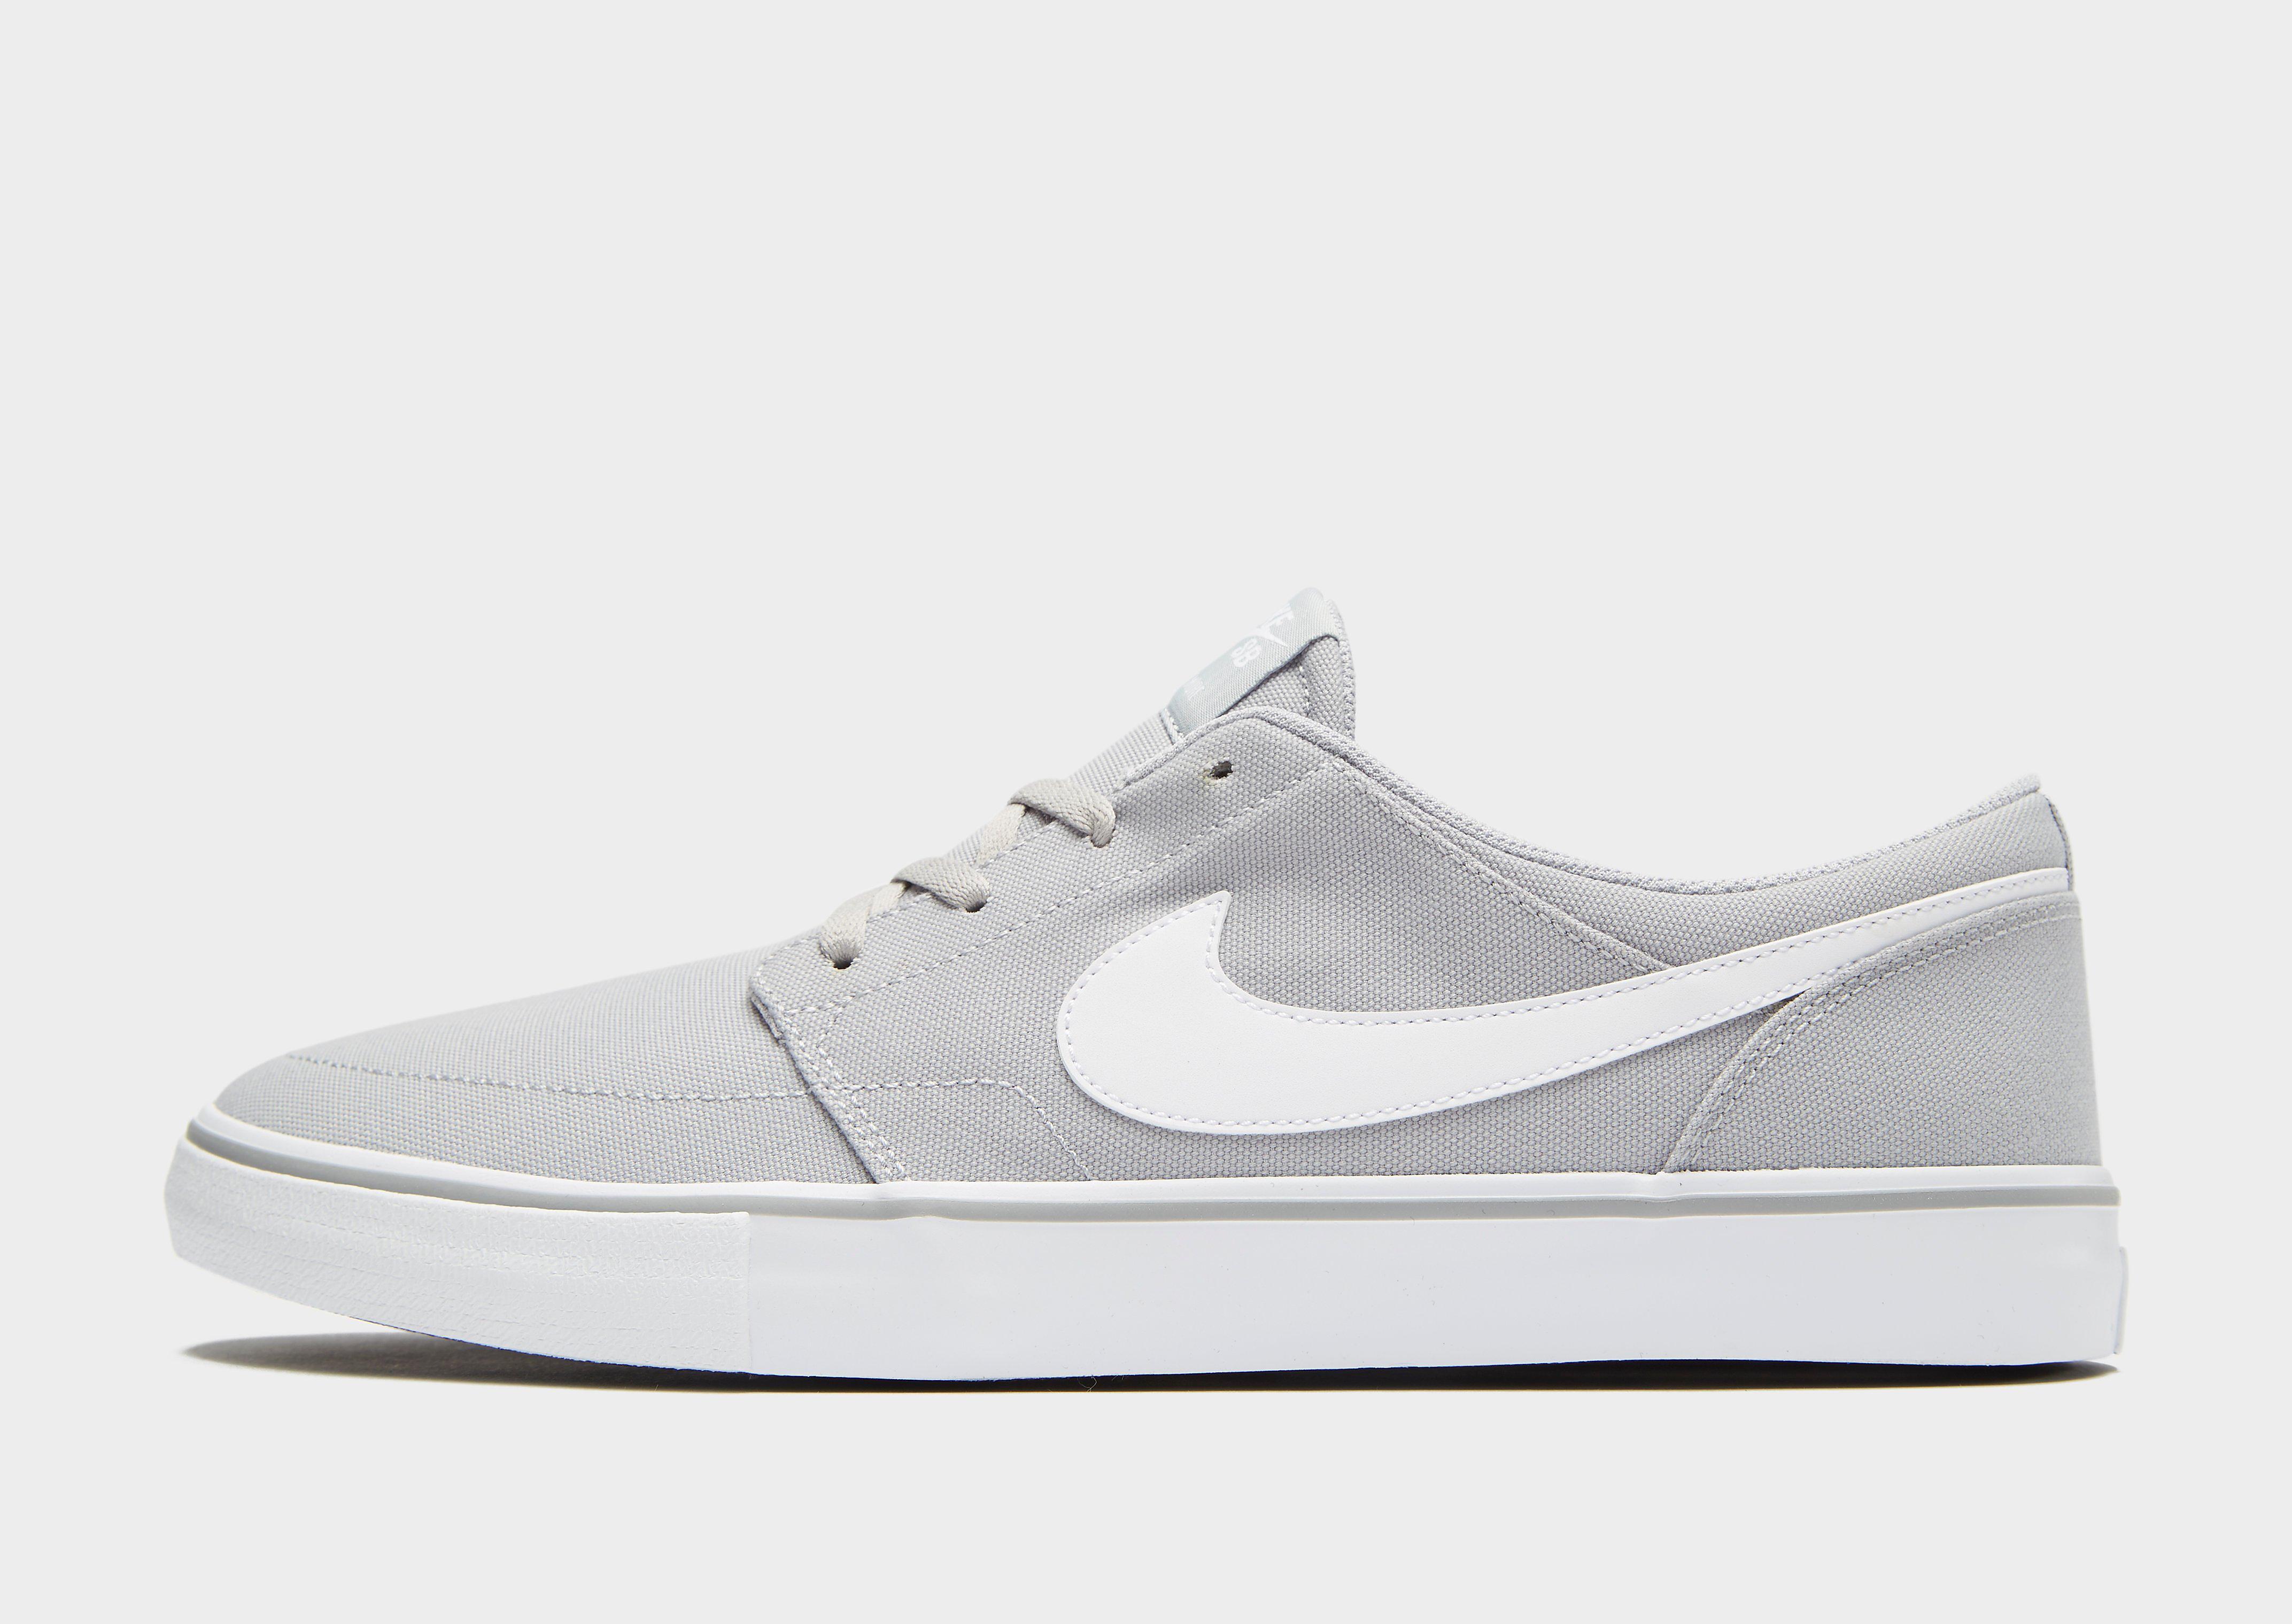 Nike SB Solarsoft Portmore